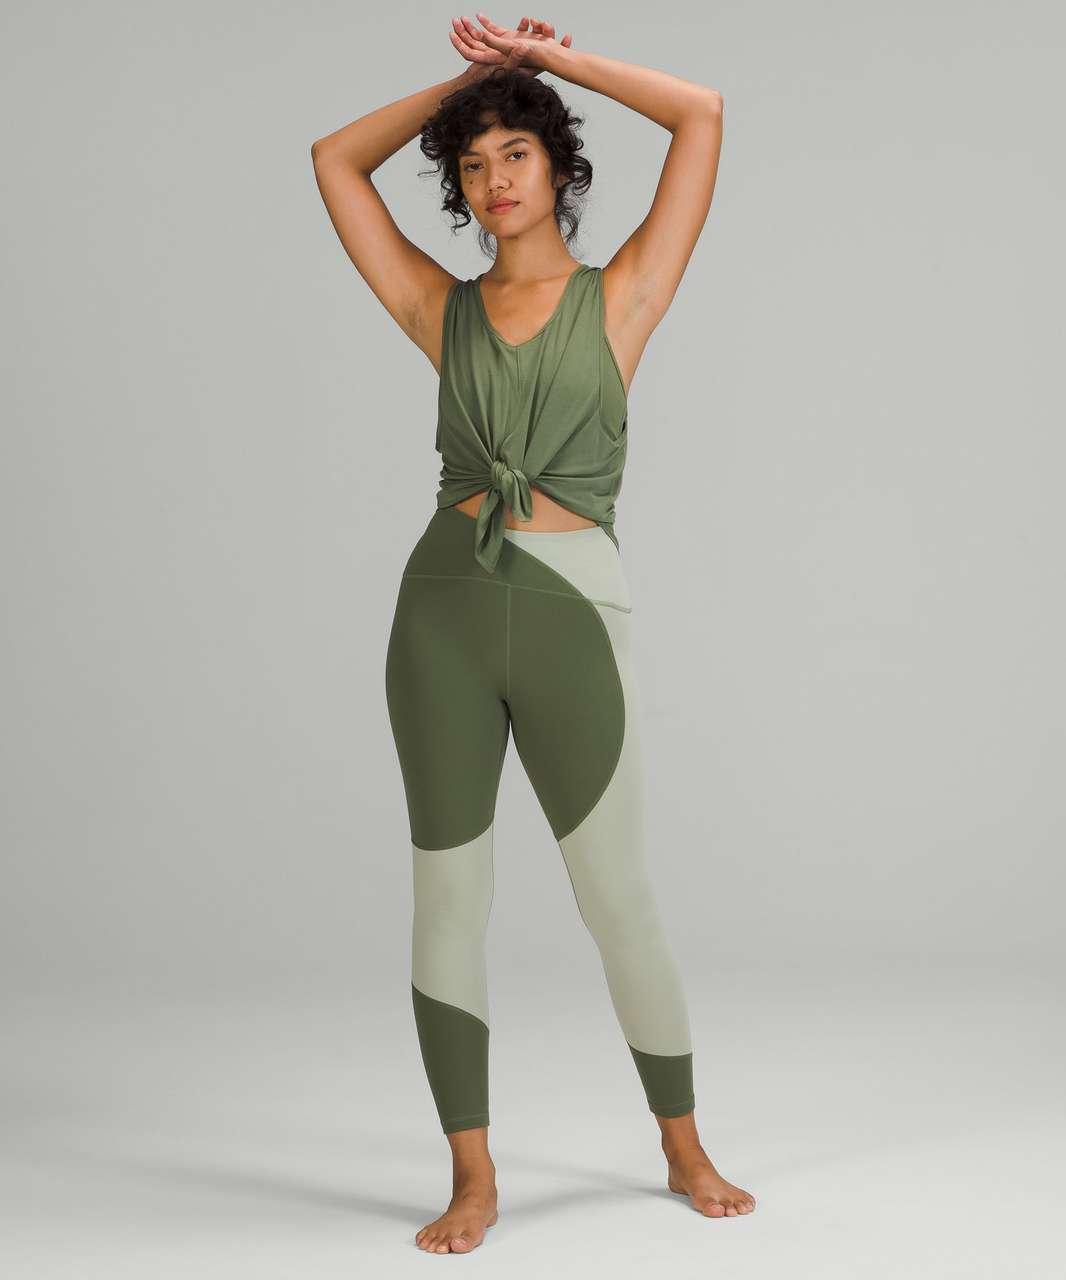 "Lululemon Nulu Colour Block High-Rise Tight 25"" - Green Twill / Green Fern"